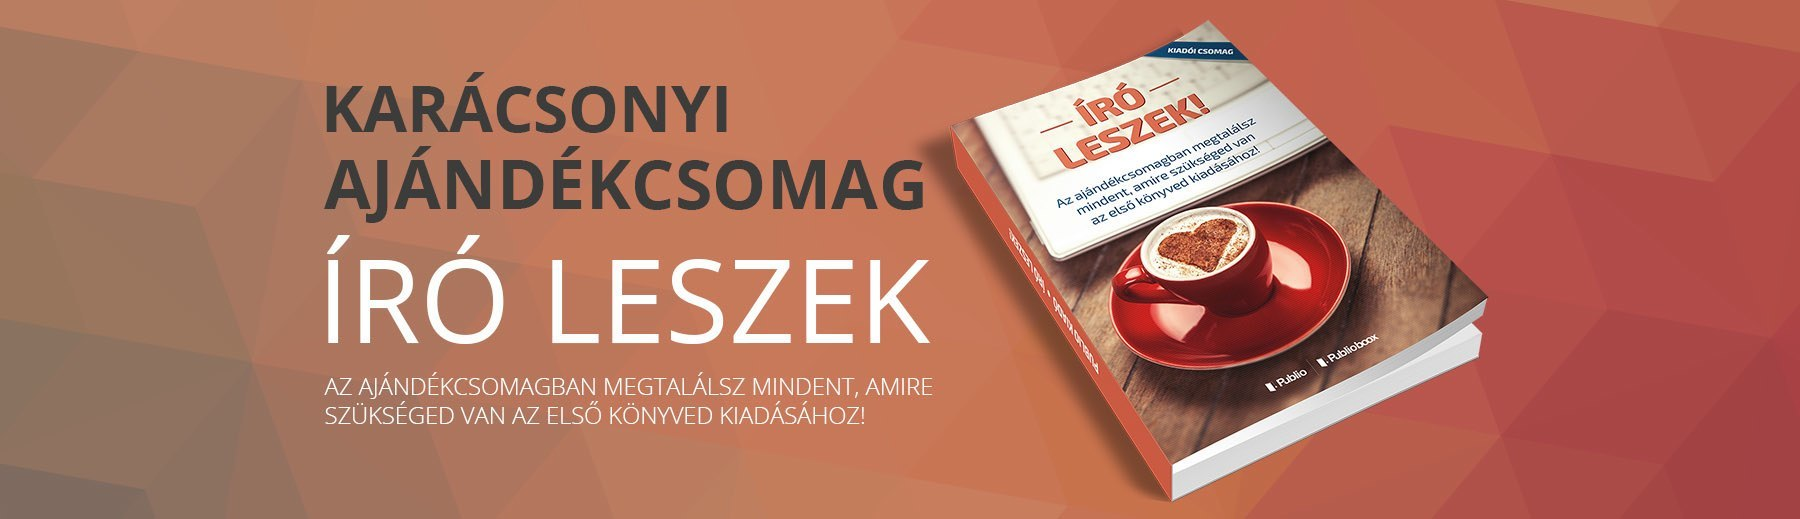 http://admin.konyvaruhaz.info/media/files/iroleszek_nagy.jpg